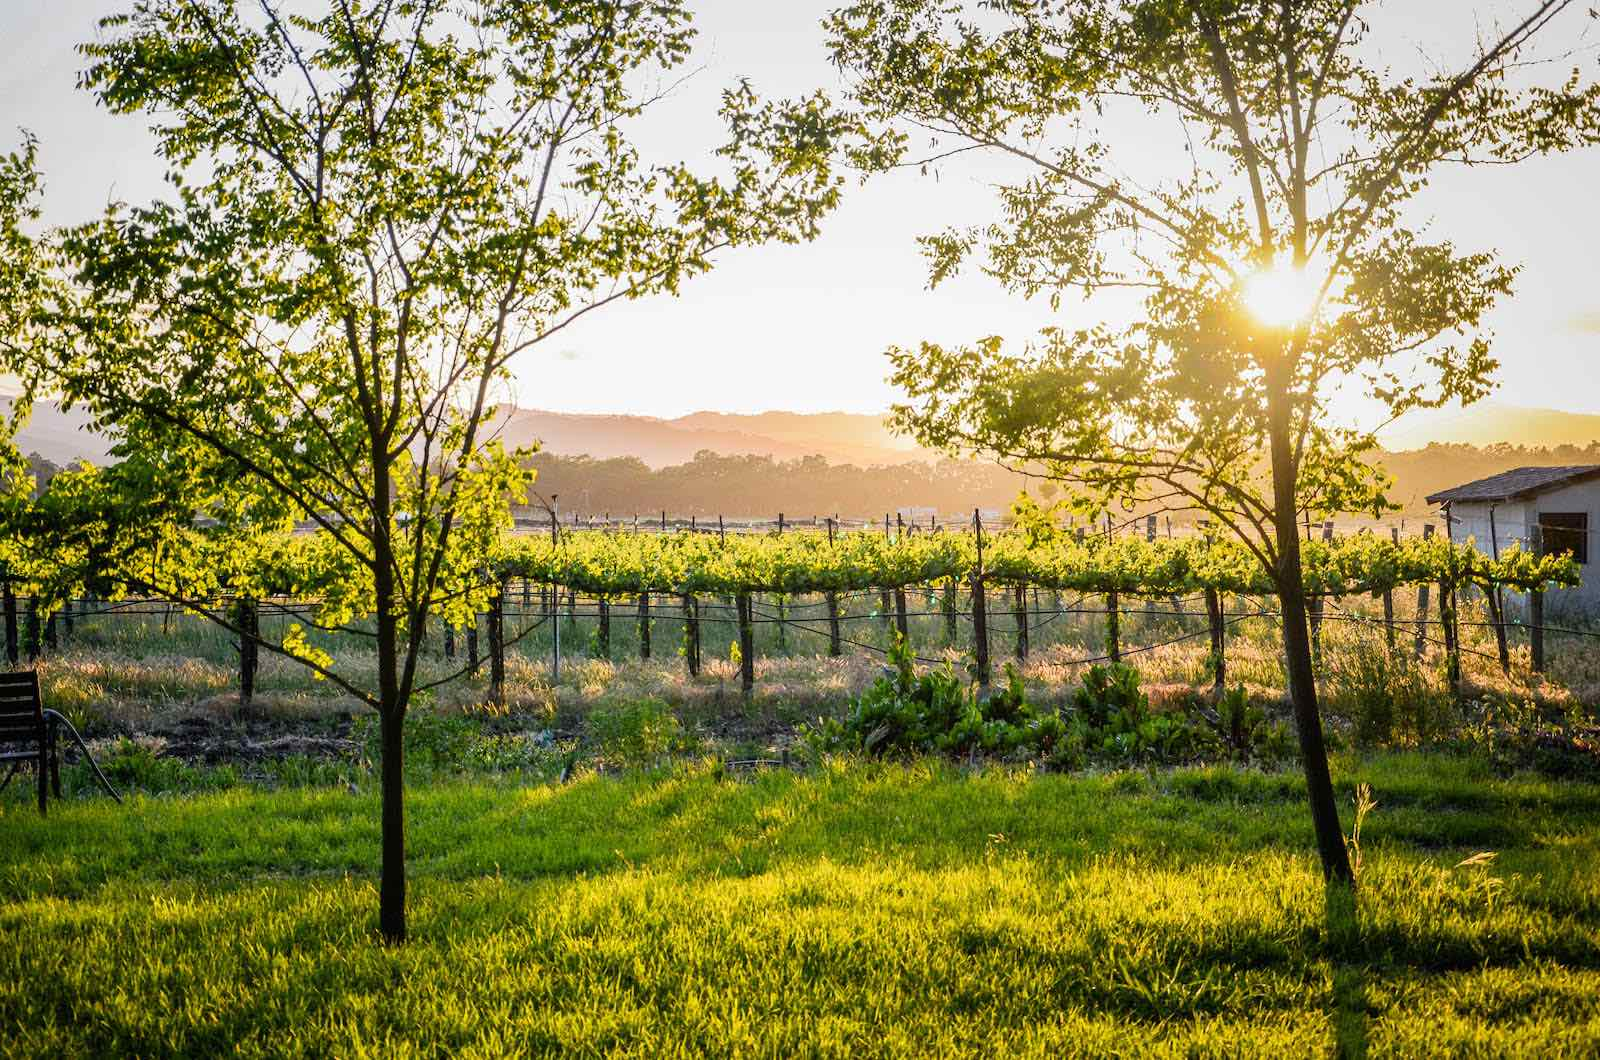 Trees, vineyard, and bright sun (c) Nathan DeHart